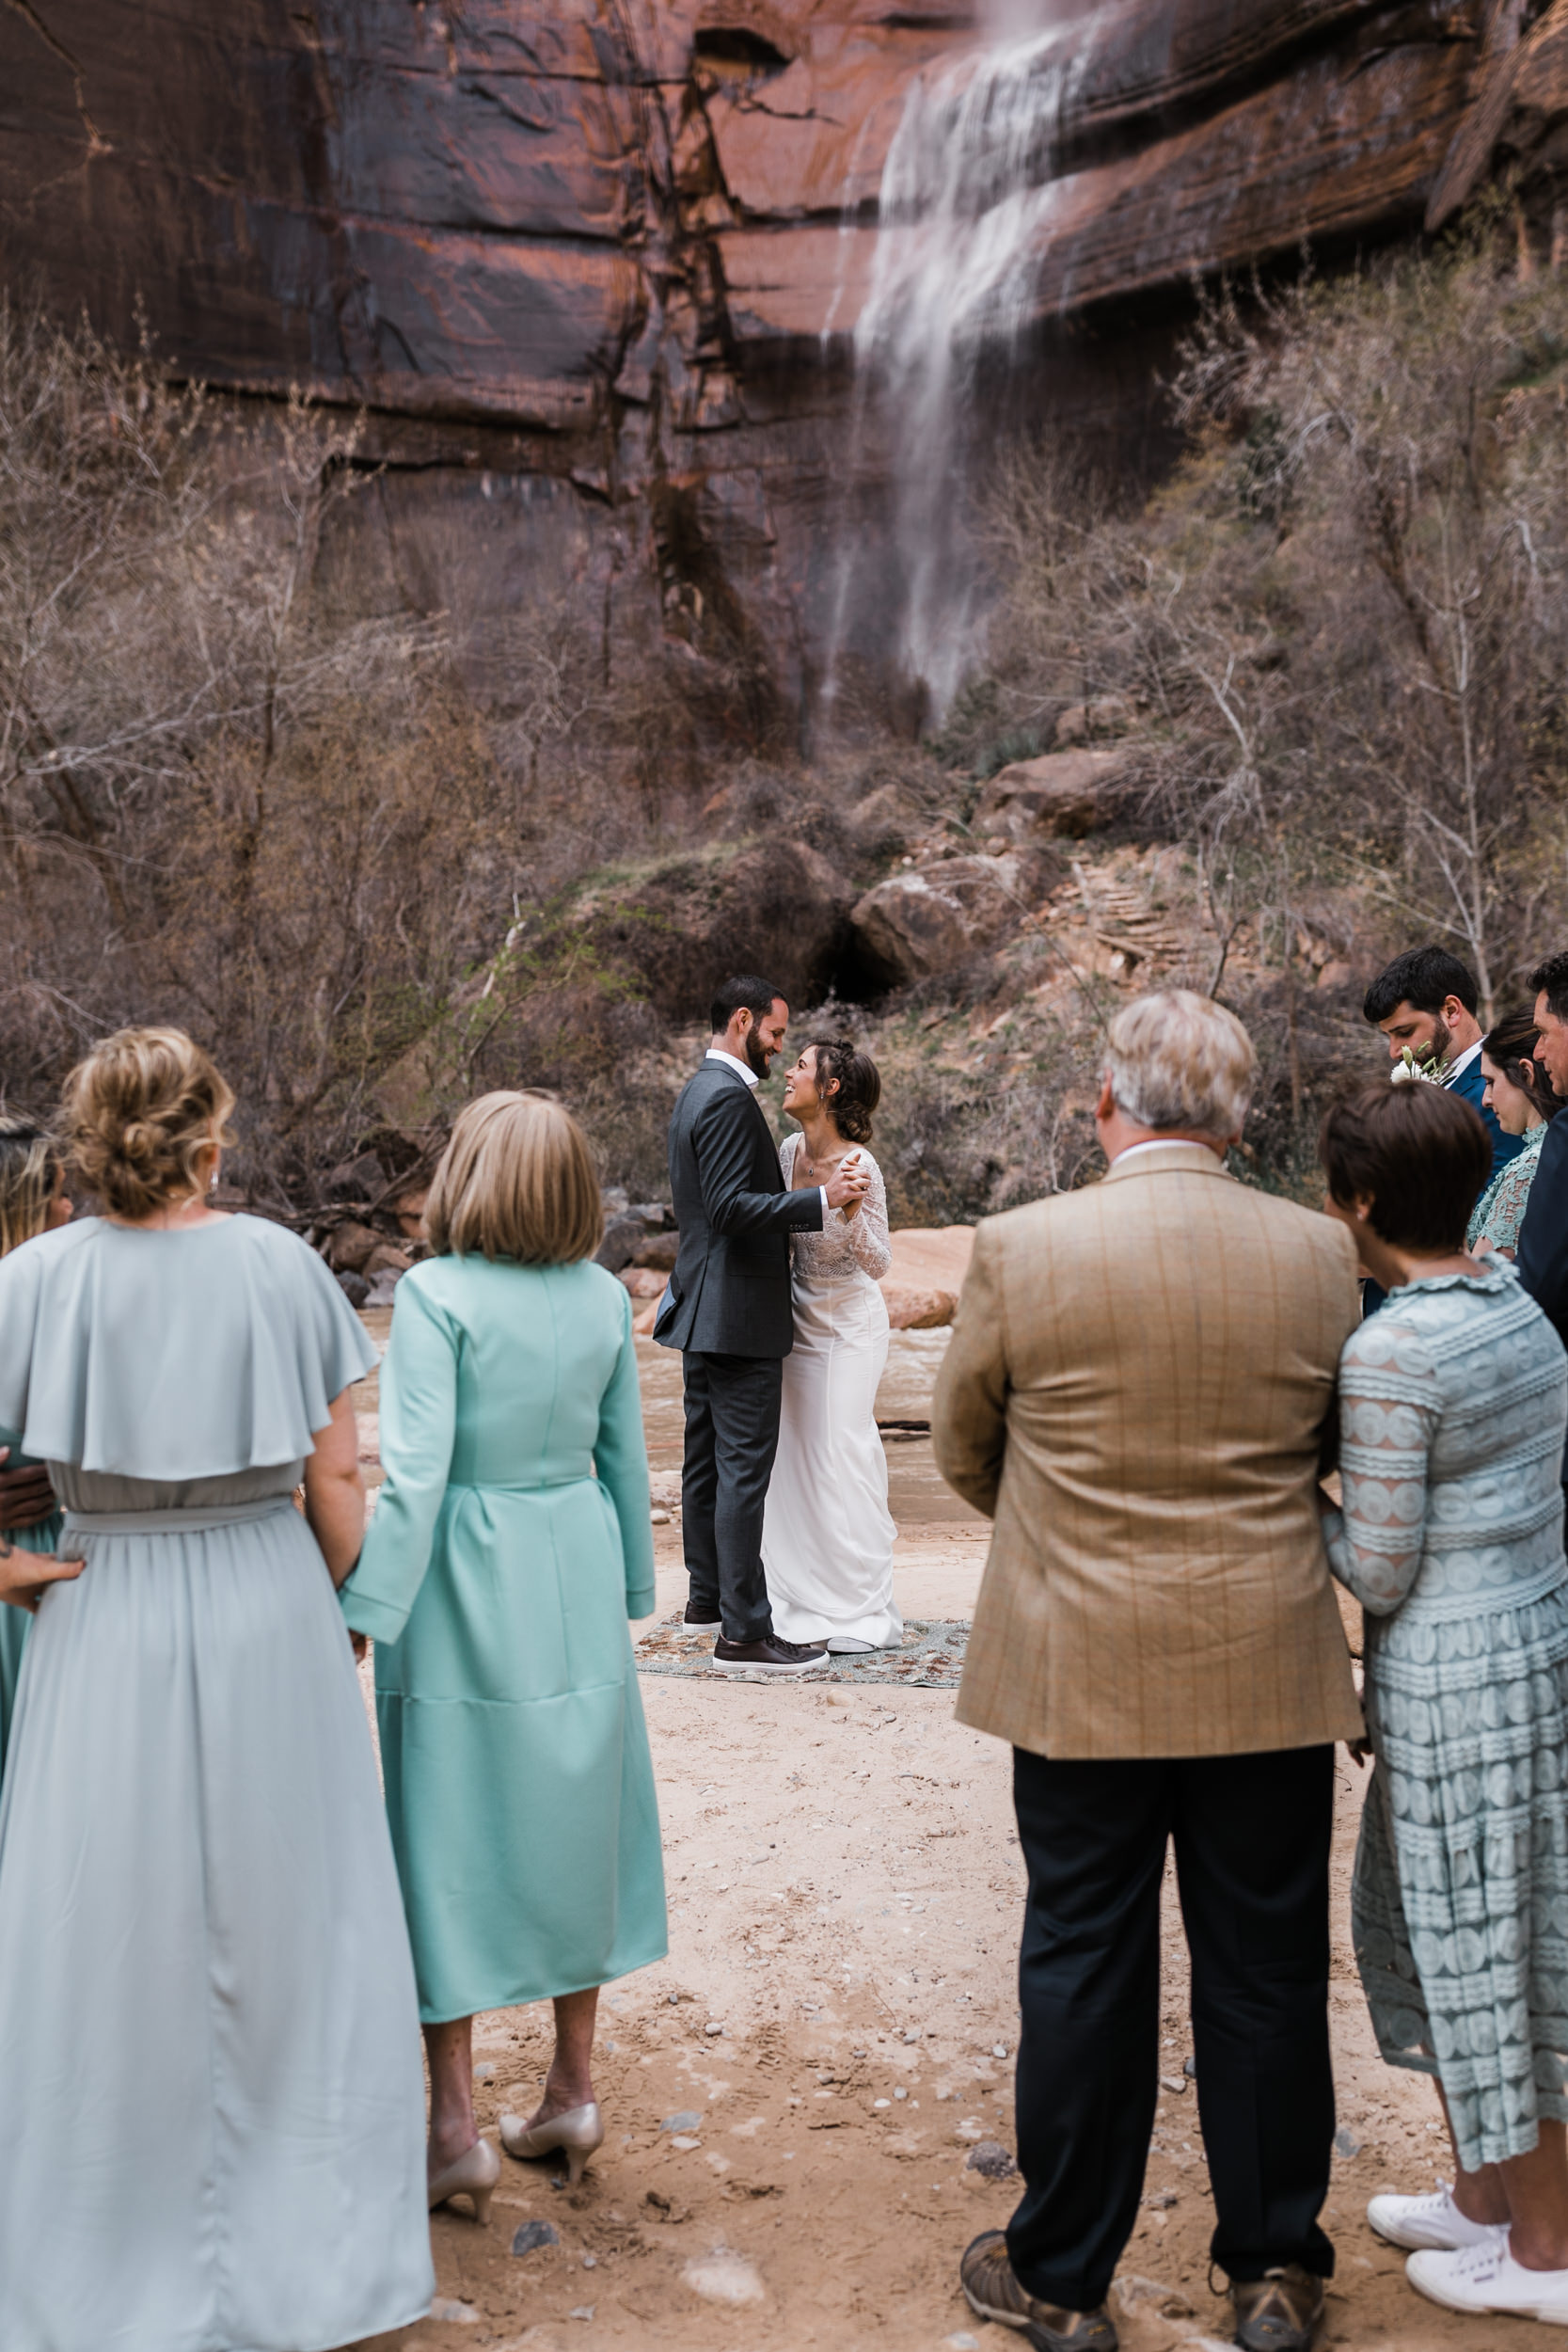 Zion-National-Park-Adventure-Wedding-Hearnes-Elopement-Photography-25.jpg